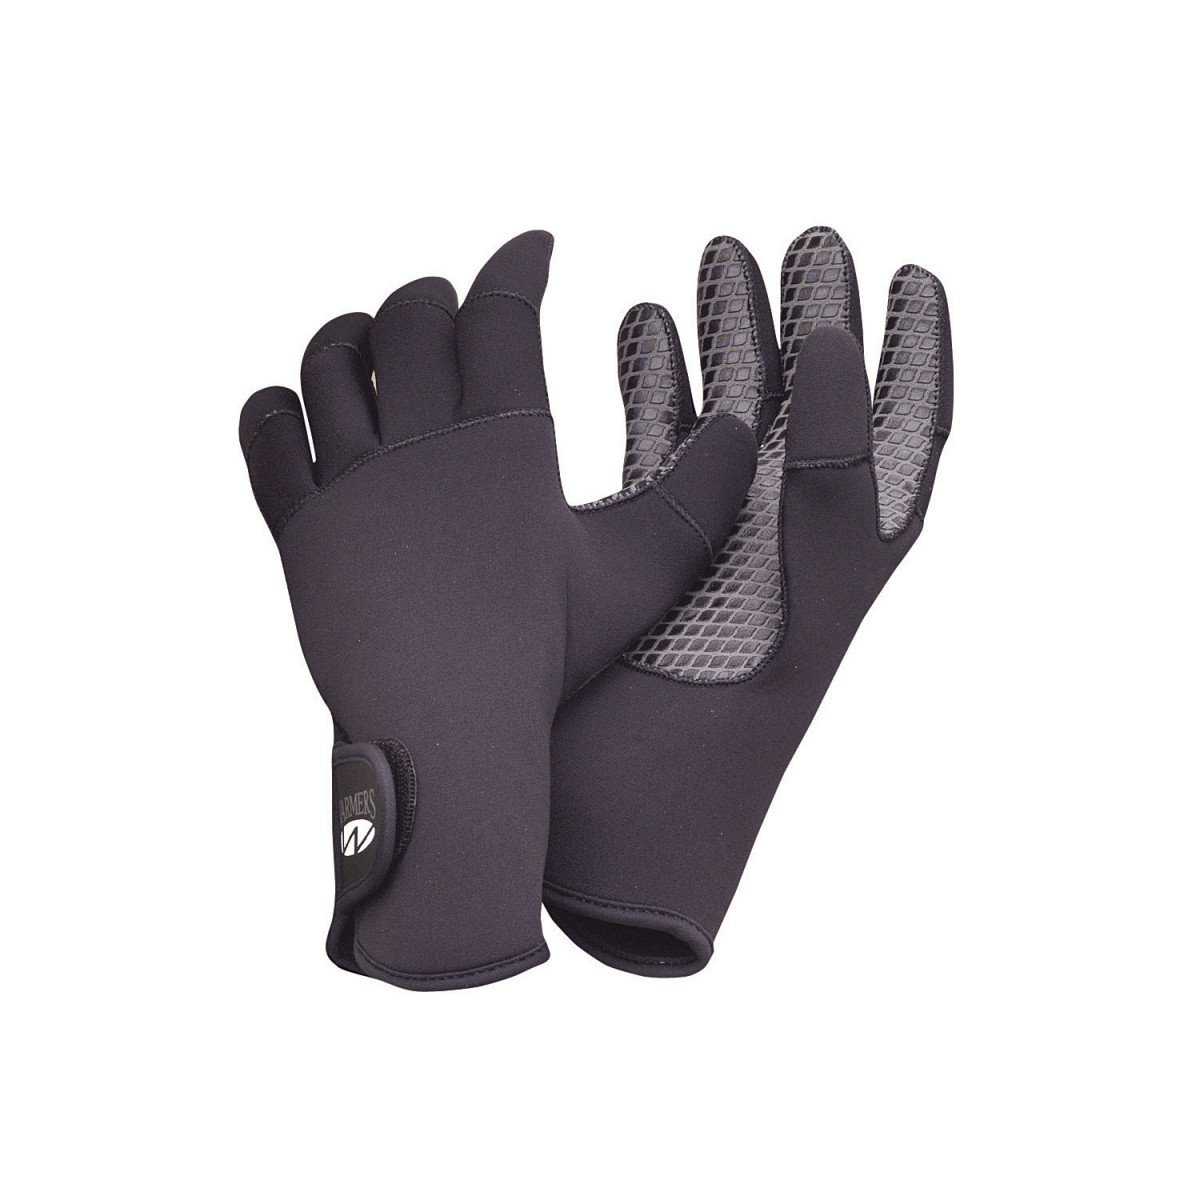 Aqua Lung Paddler Gloves